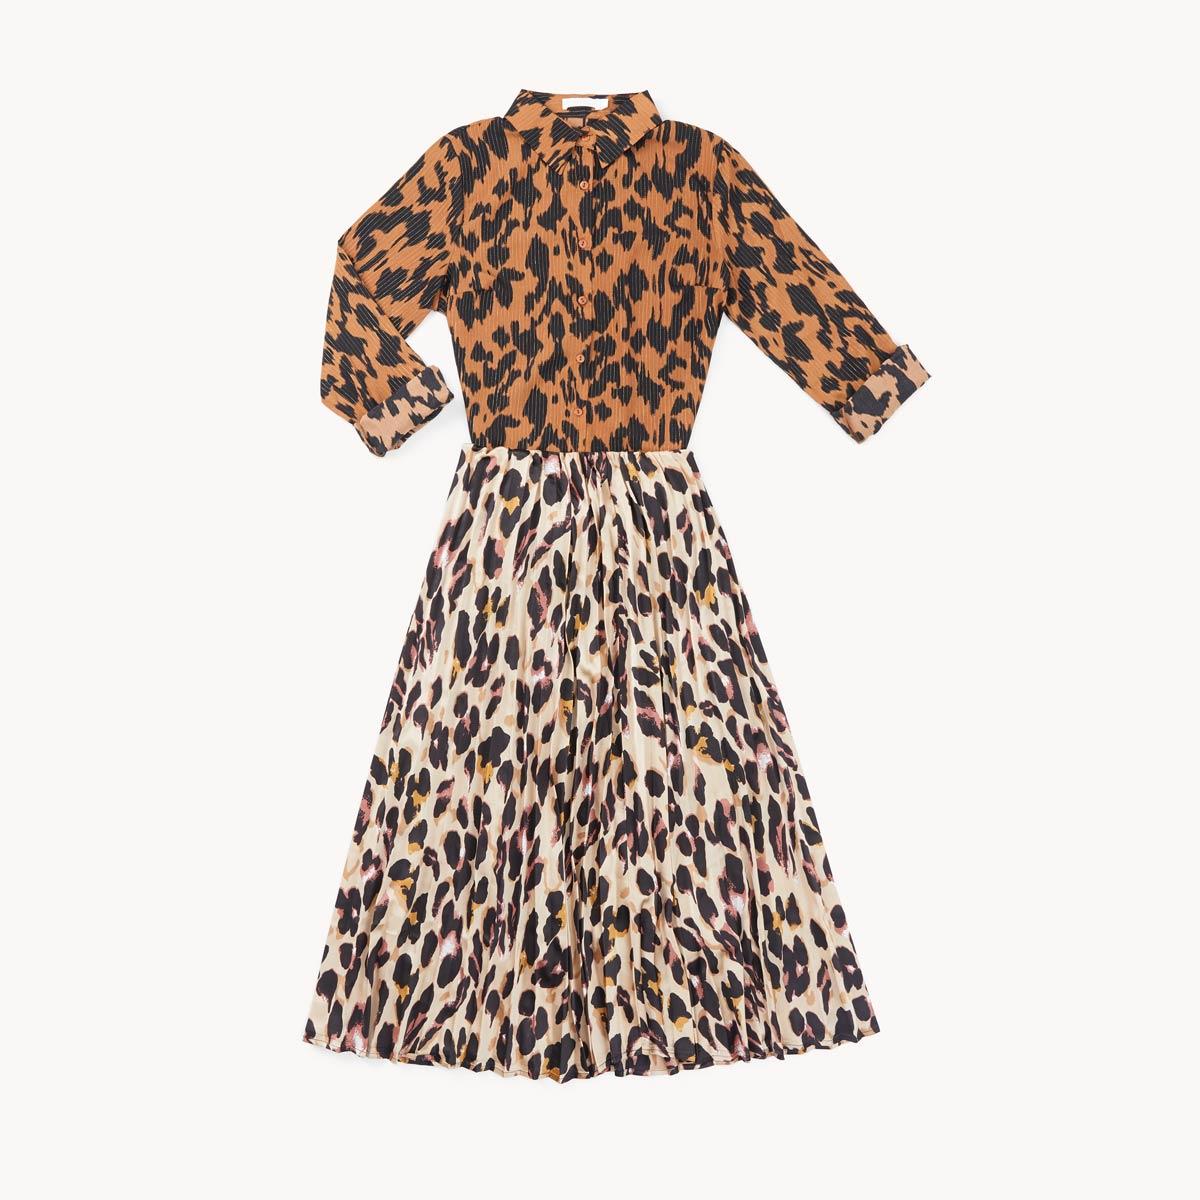 falda midi y blusa animal print tendencia mix and match